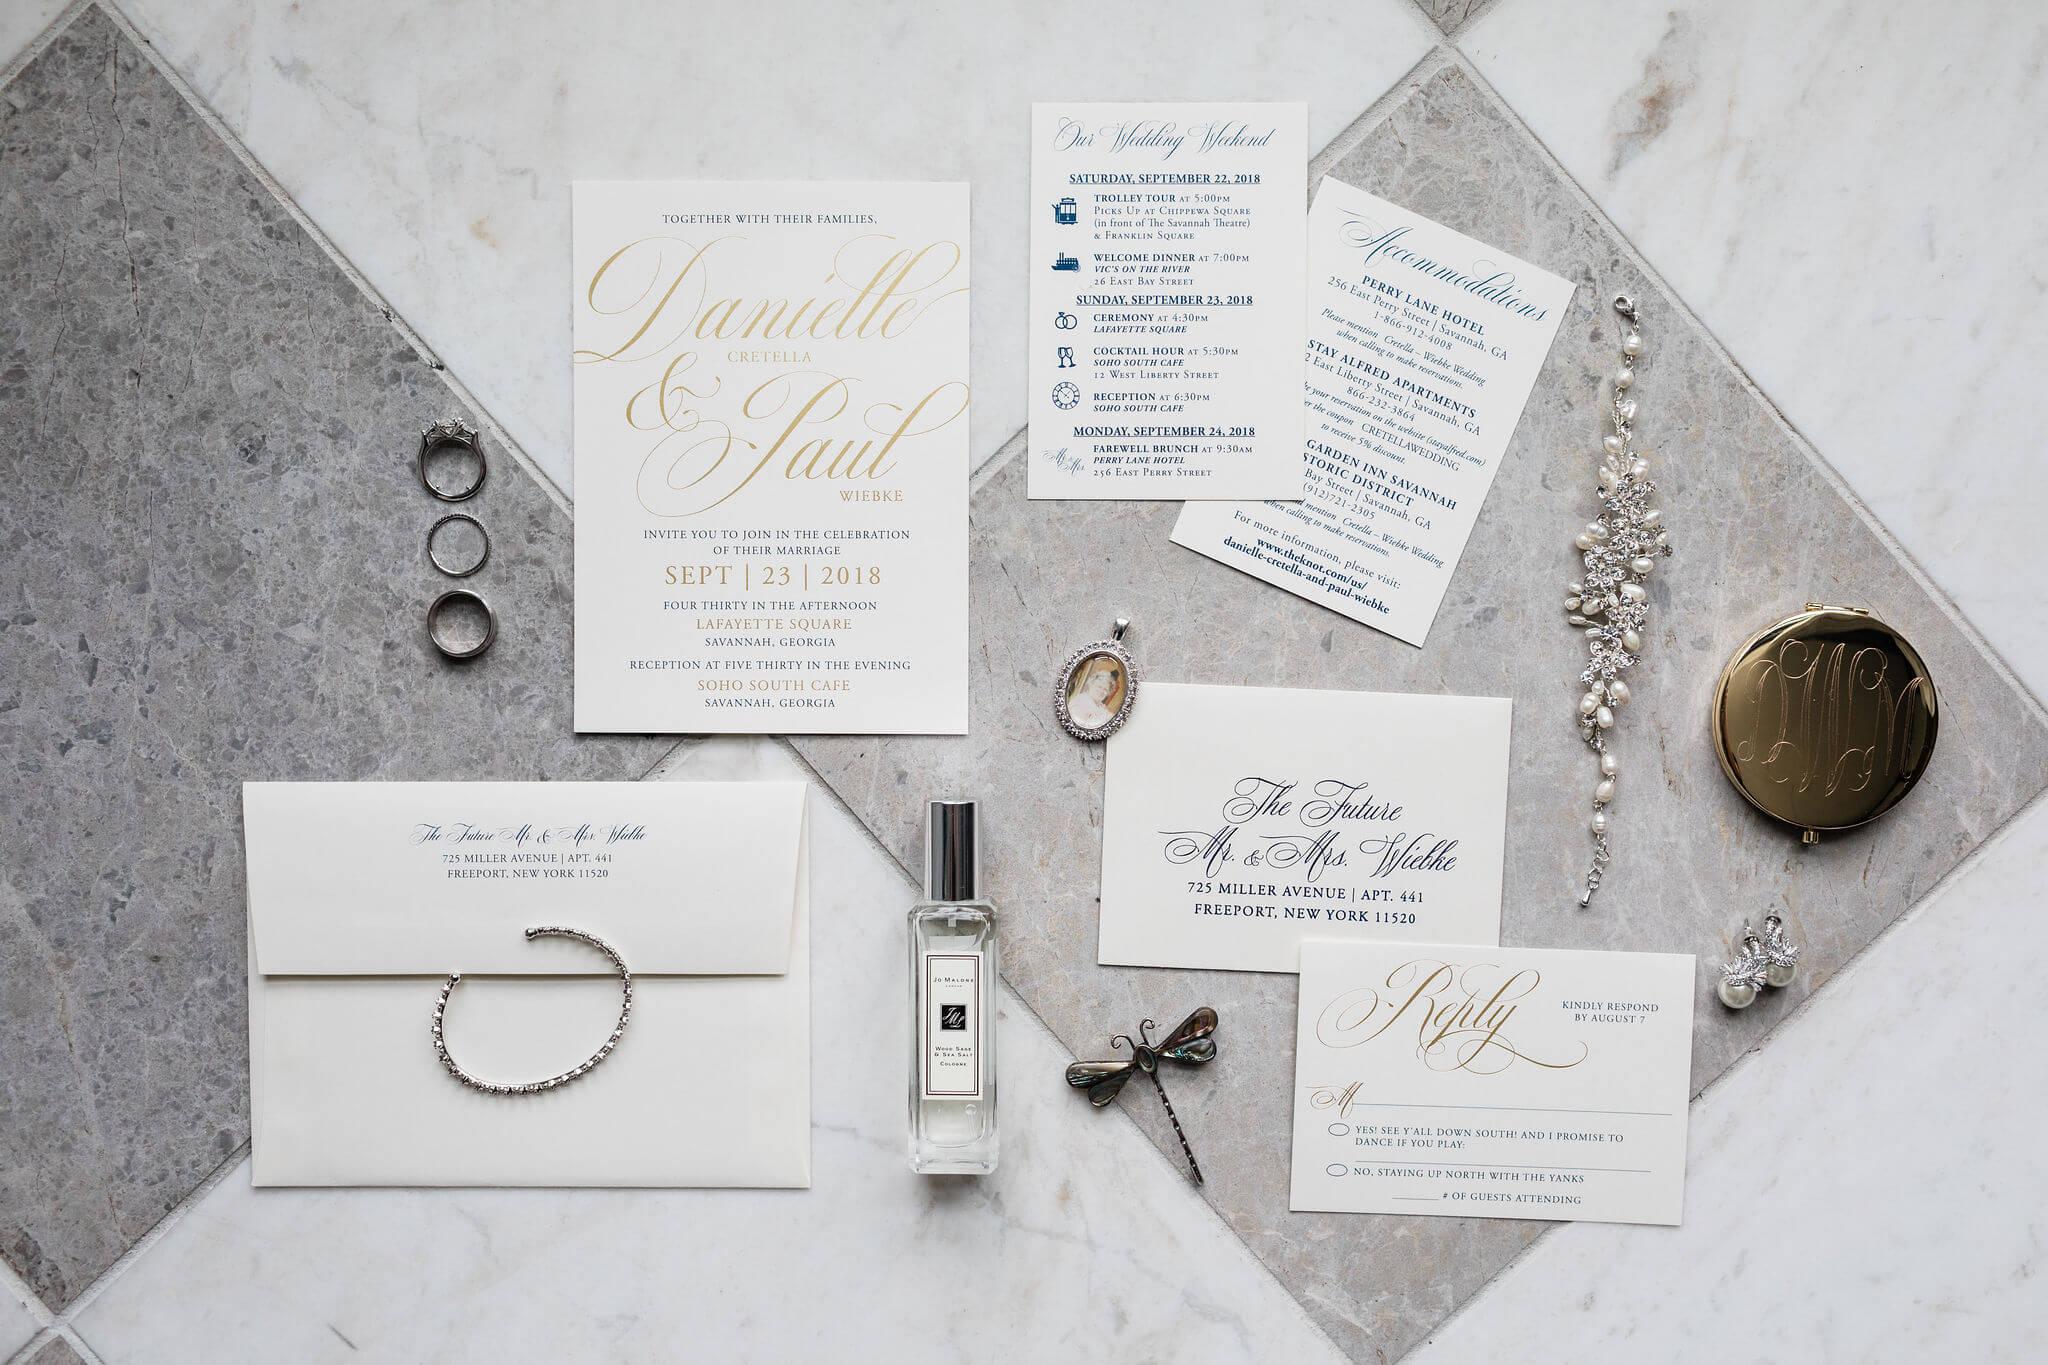 apt-b-photography-savannah-wedding-photographer-savannah-wedding-savannah-elopement-intimate-wedding-photographer-5.jpg